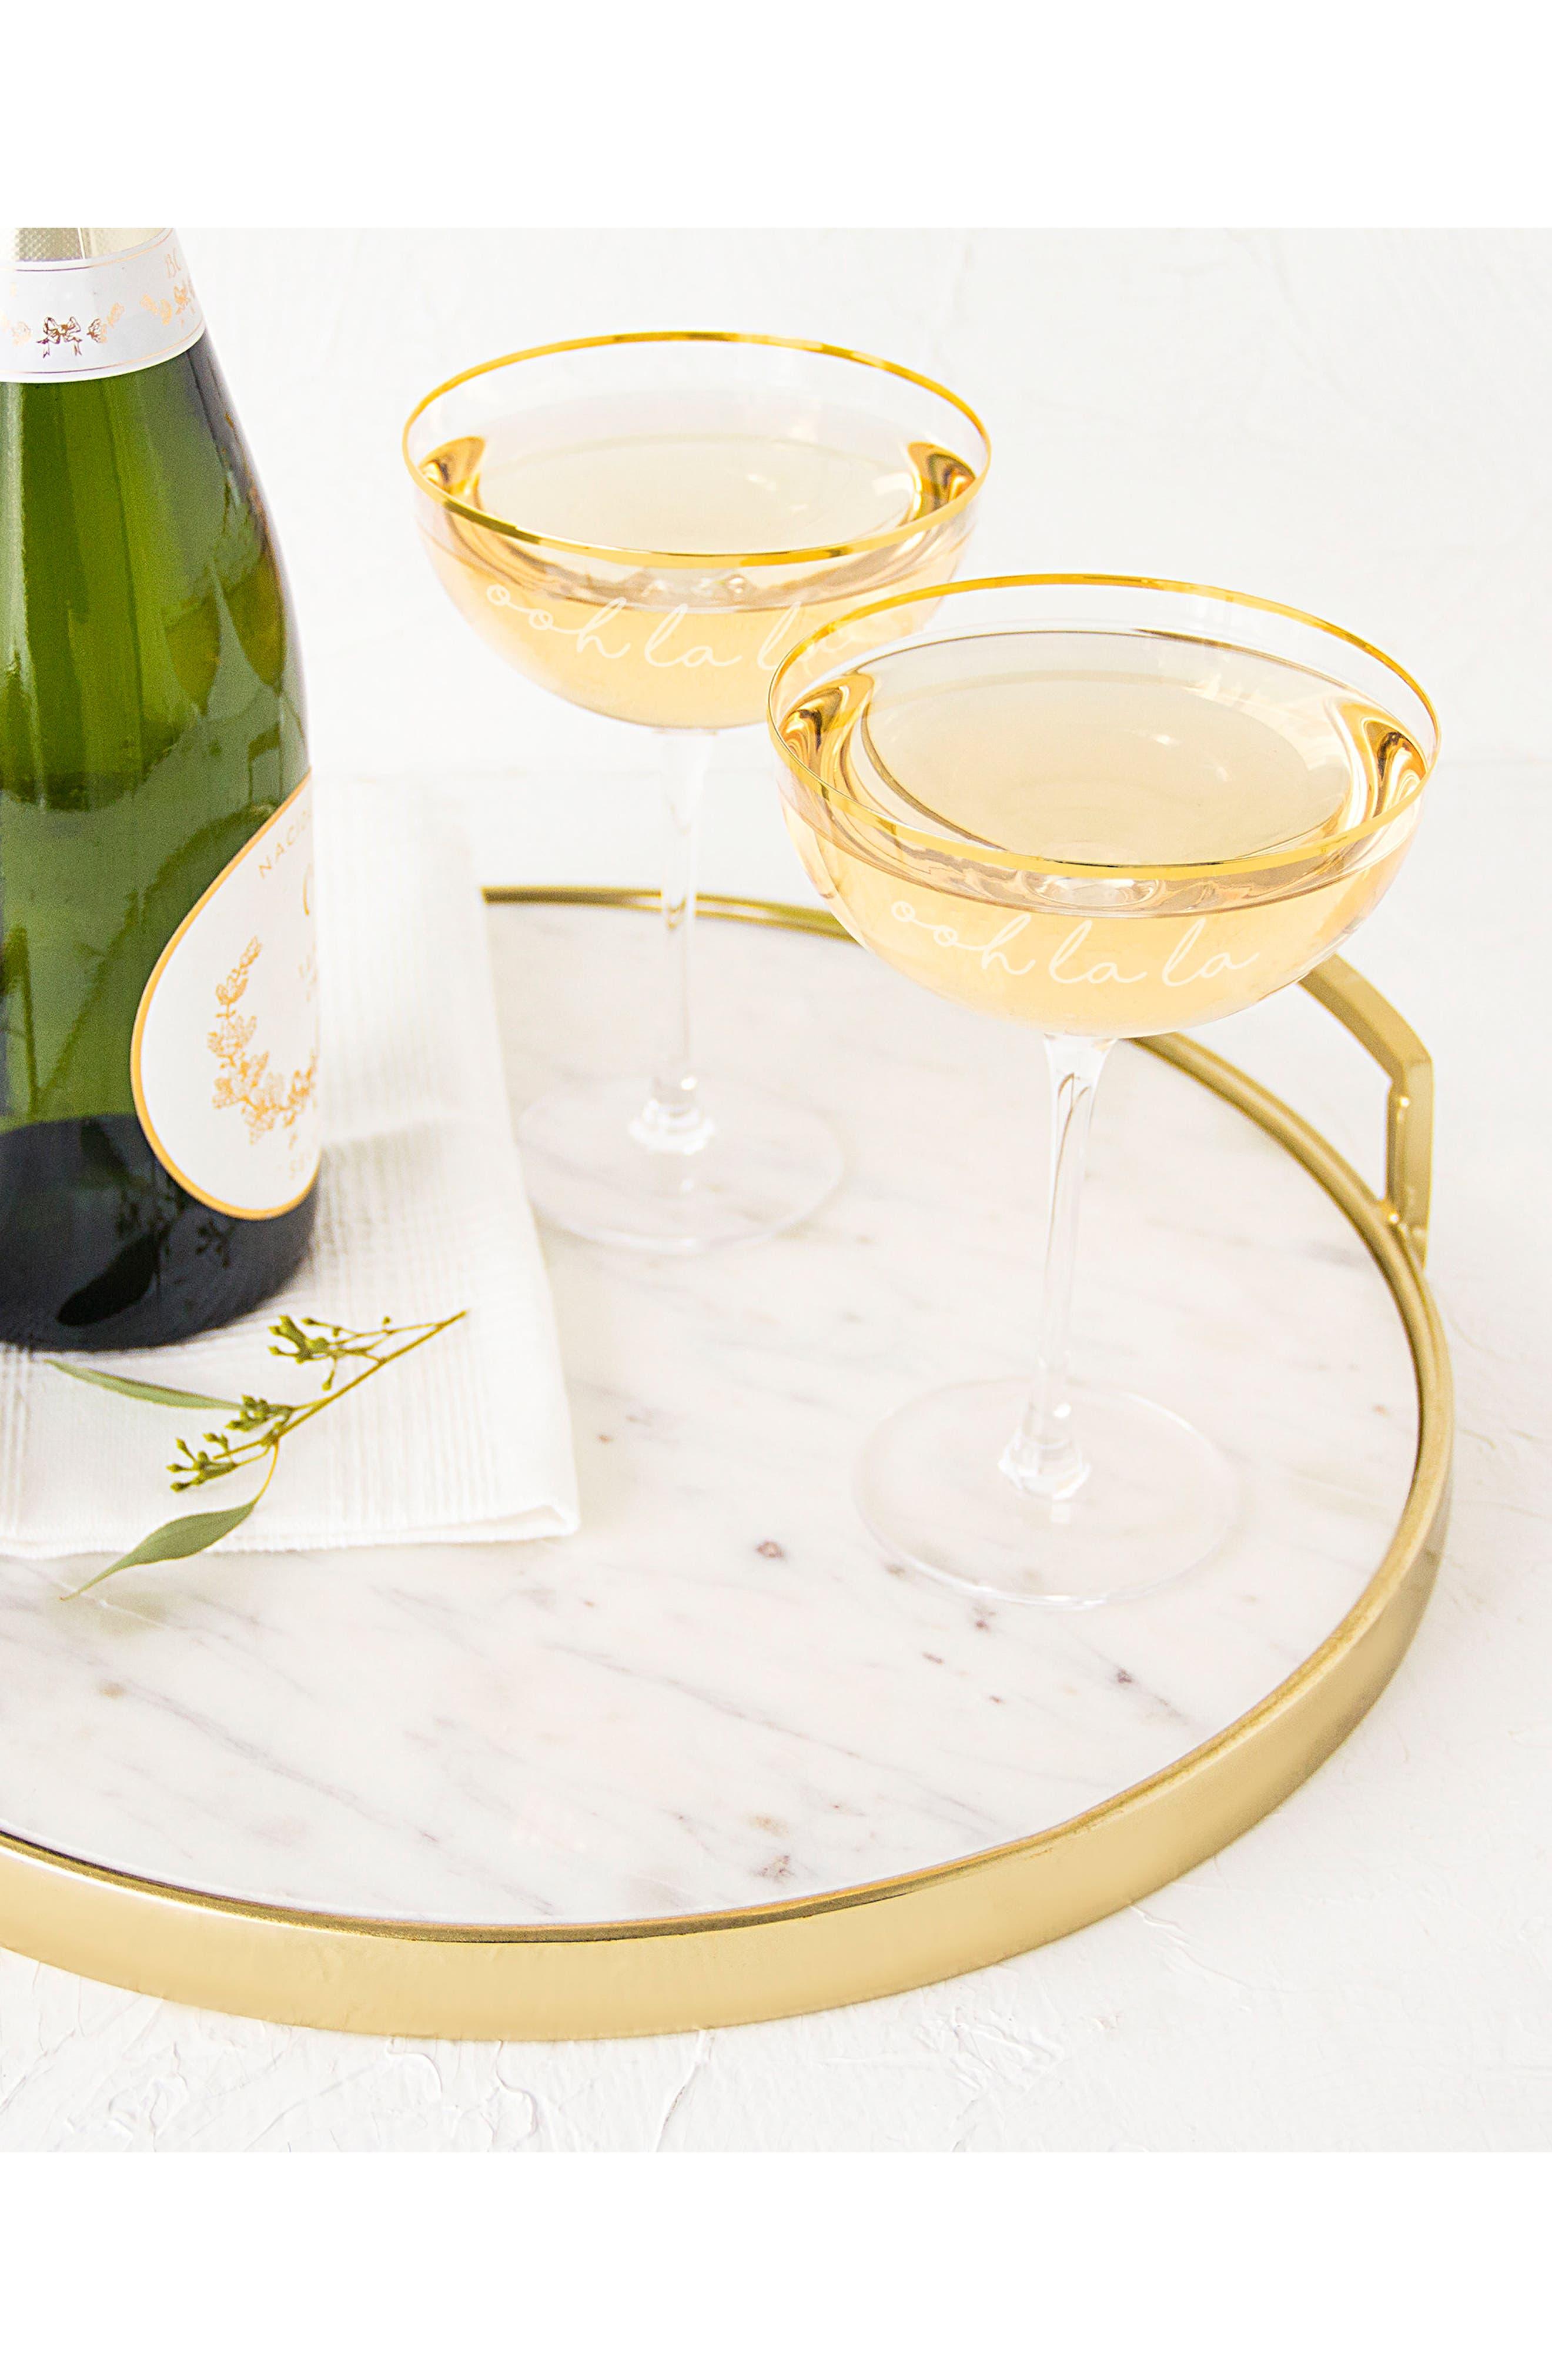 Ooh La La Set of 2 Champagne Coupes,                             Alternate thumbnail 4, color,